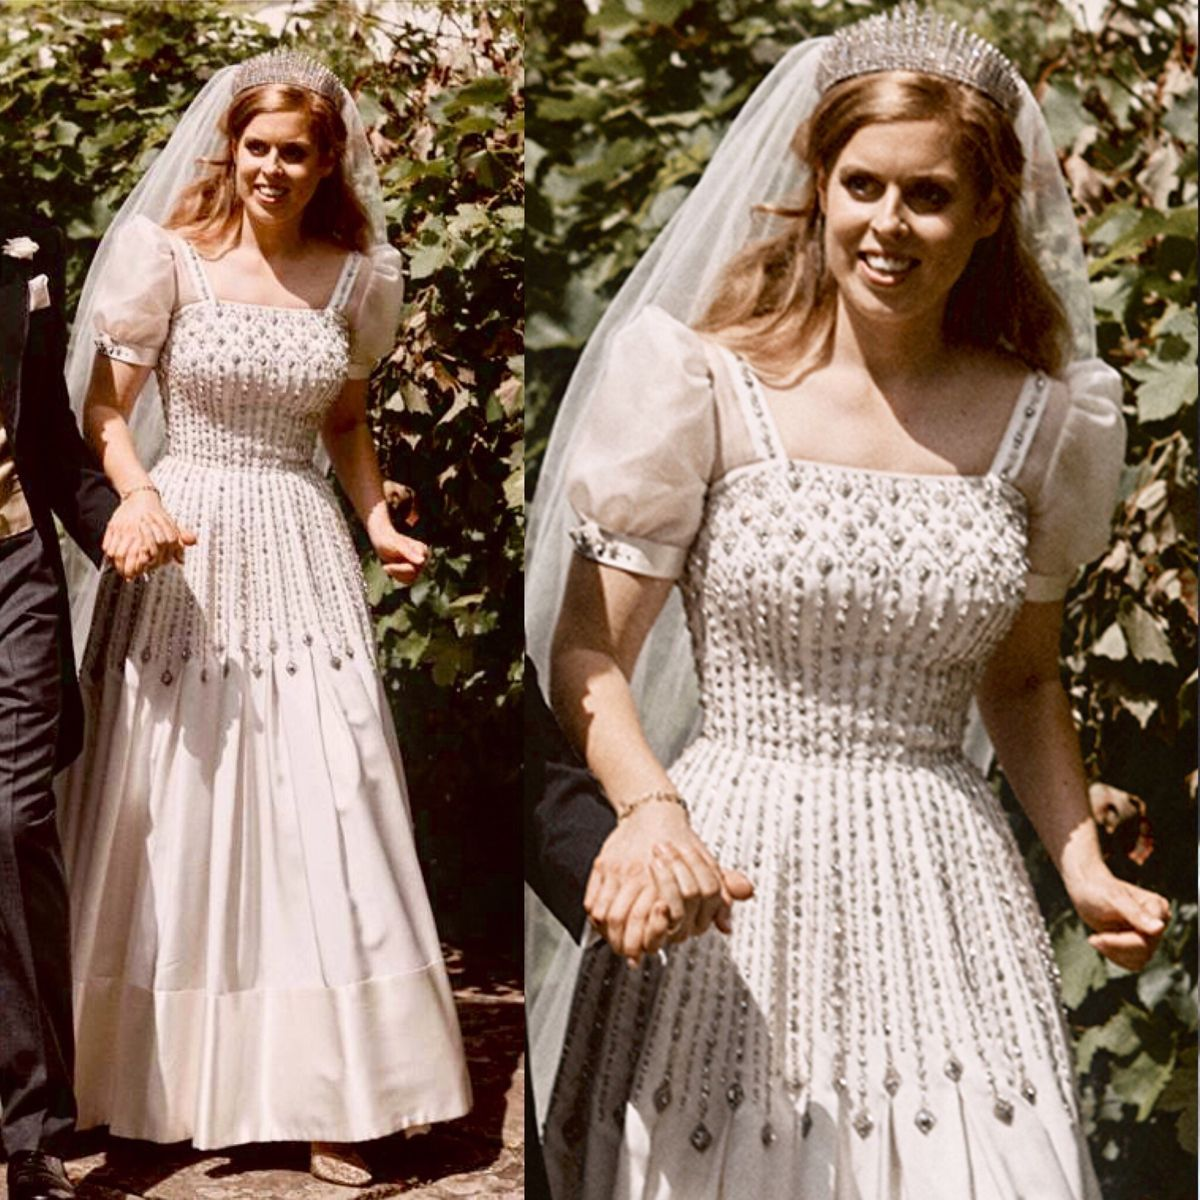 Princess Beatrice wedding dress in 2020 Princess